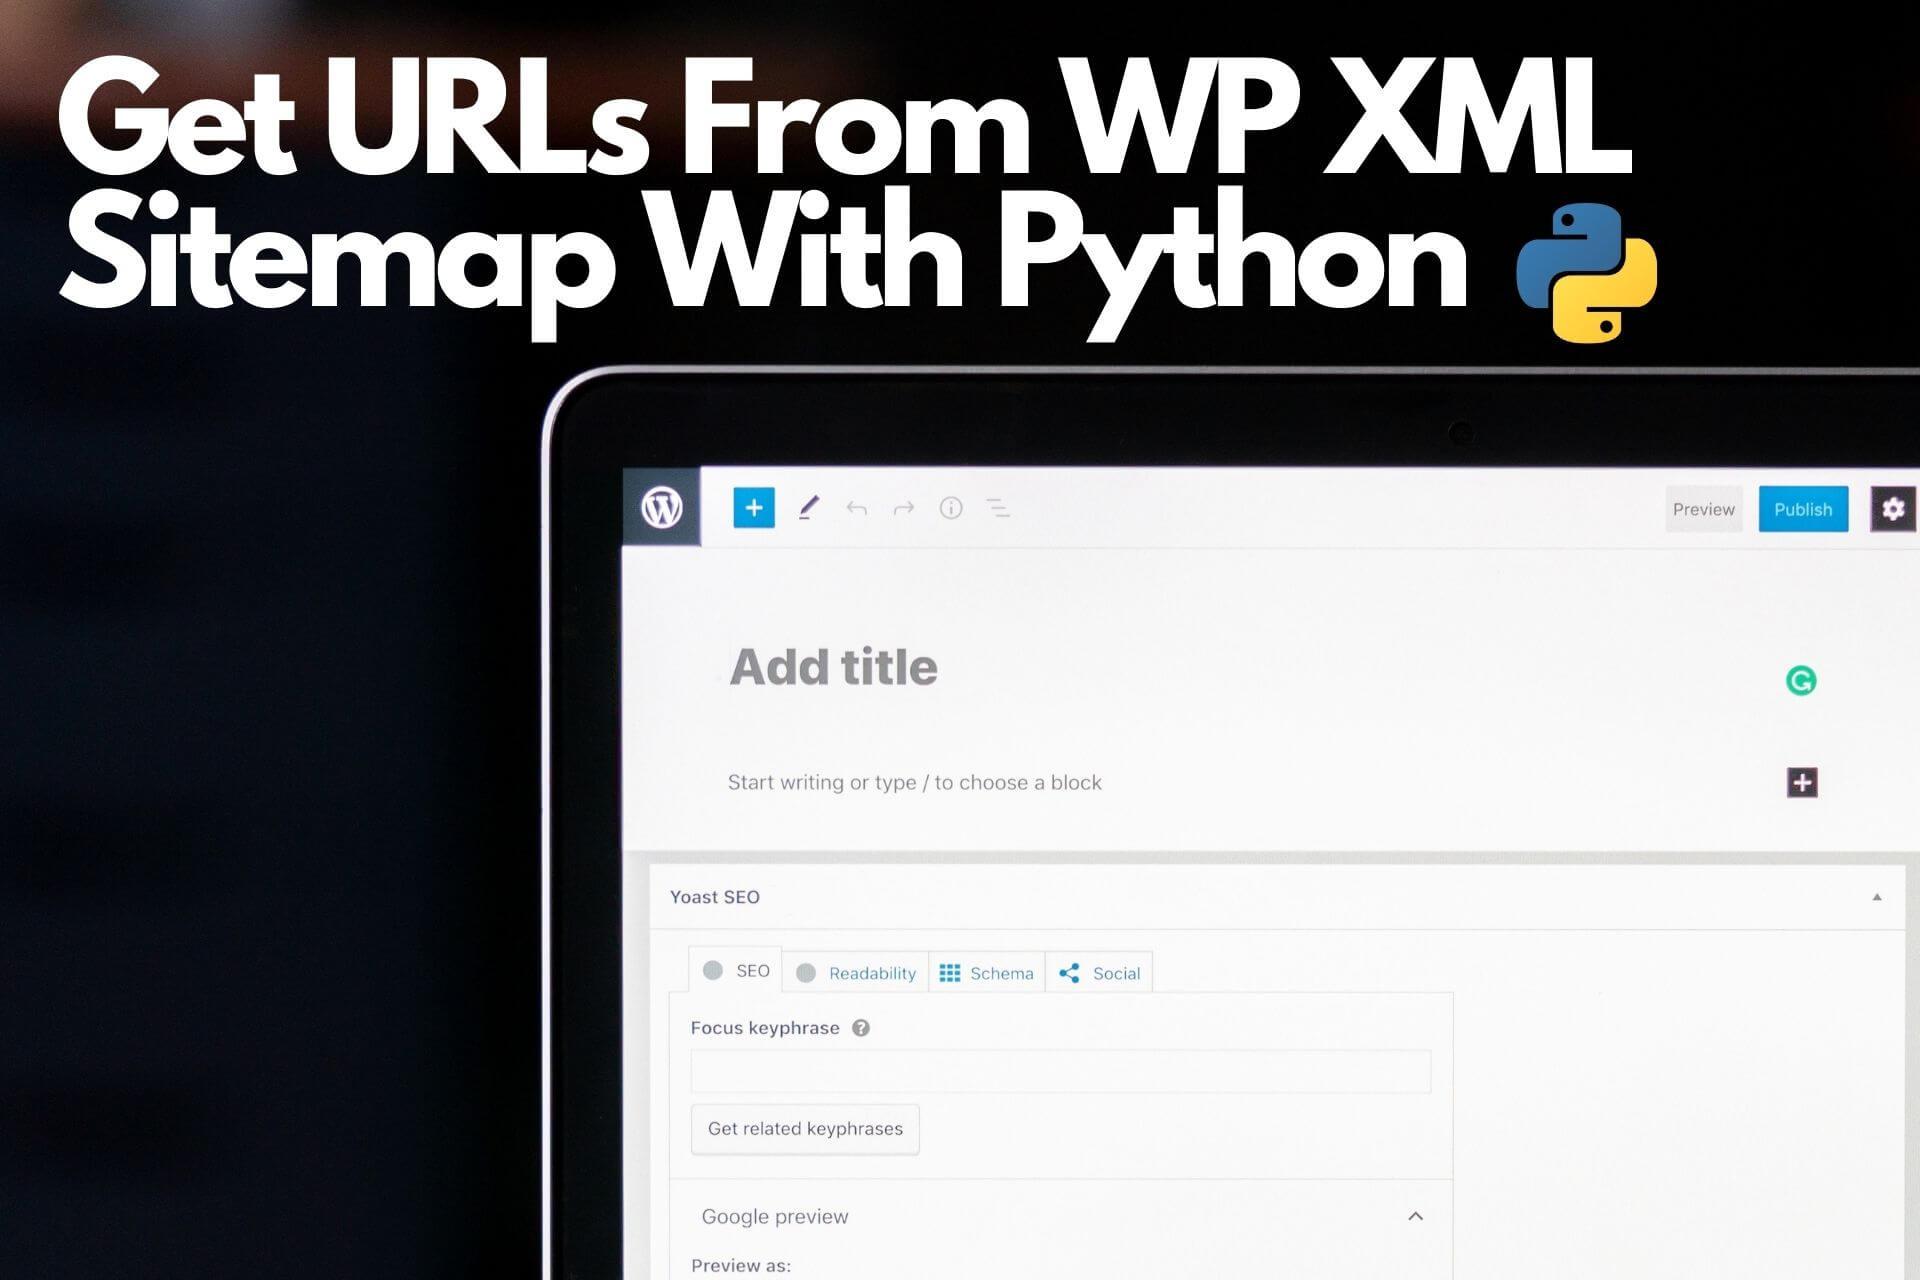 How to Get WordPress XML Sitemap URLs Using Python